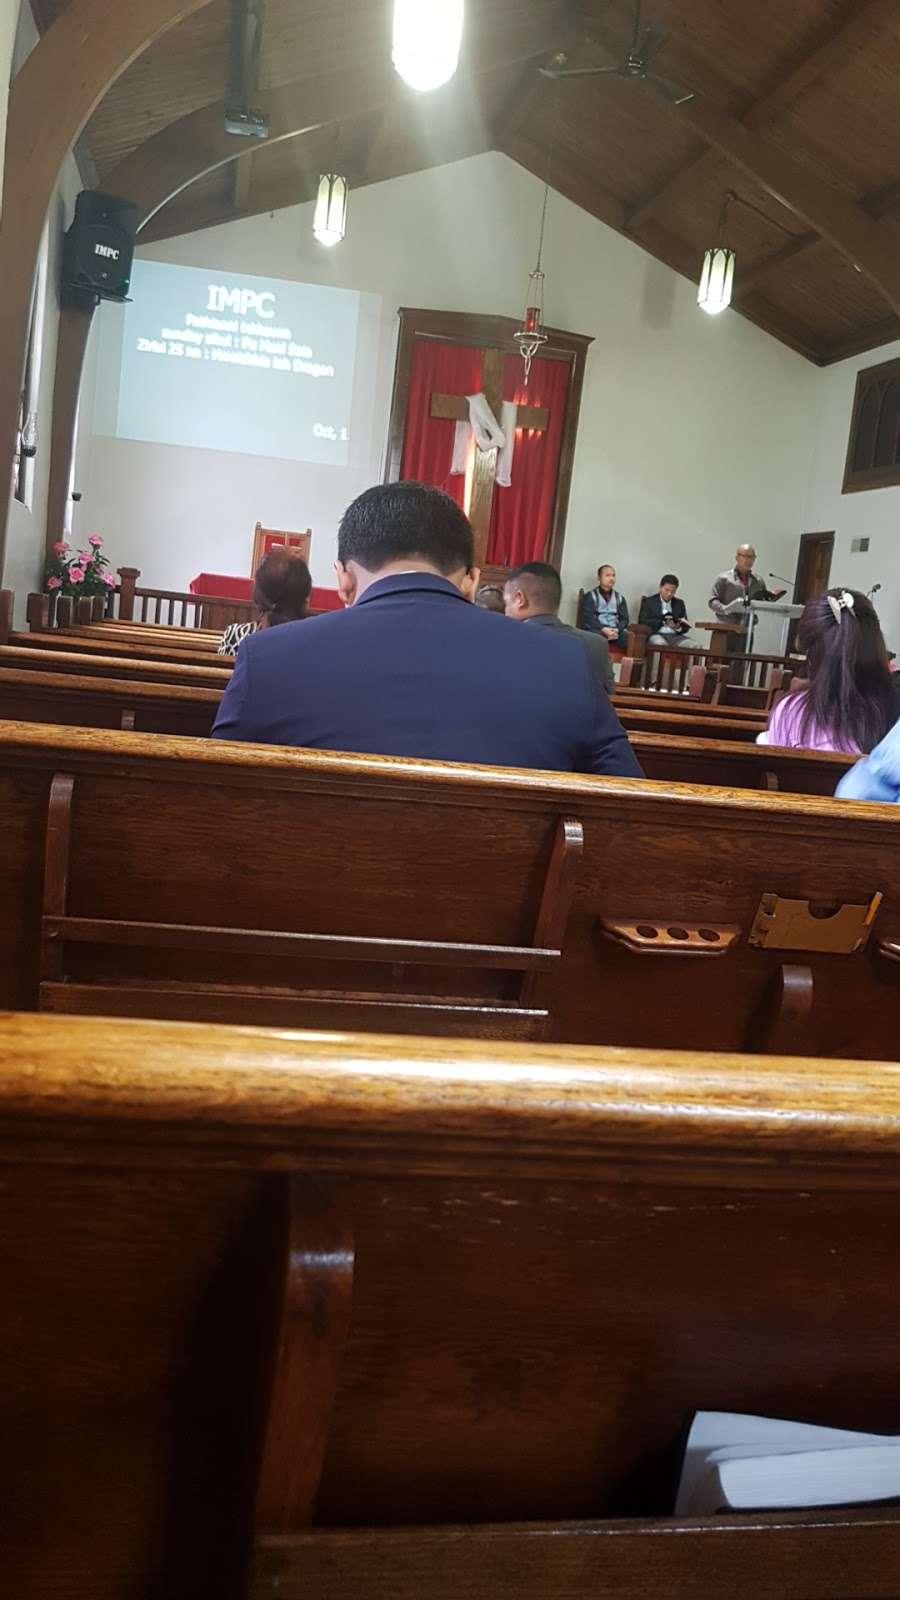 Indiana Mizo Presbyterian Church - church  | Photo 5 of 5 | Address: 4751 E Minnesota St, Indianapolis, IN 46203, USA